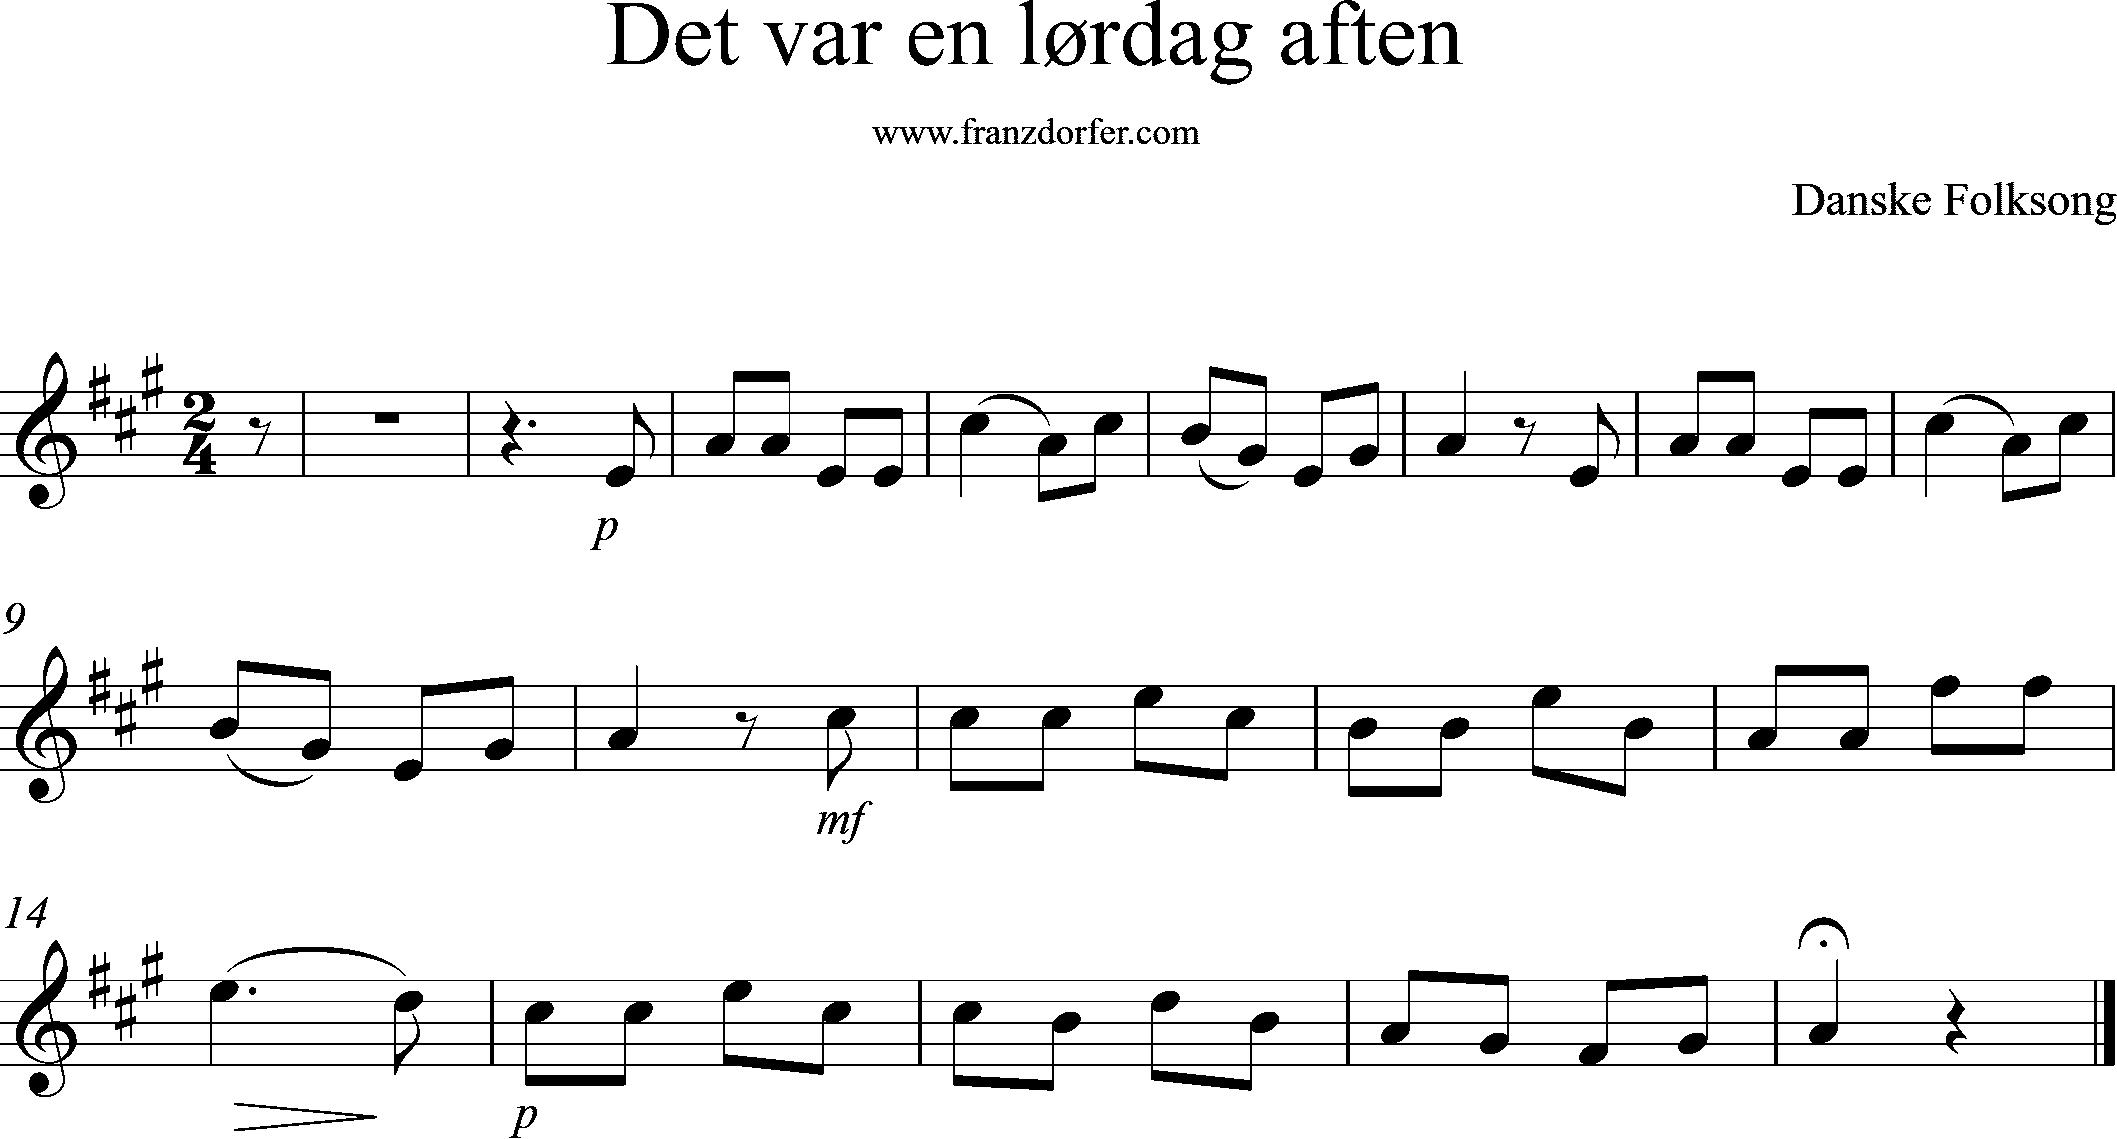 sheetmusic melody det var en lordag aften